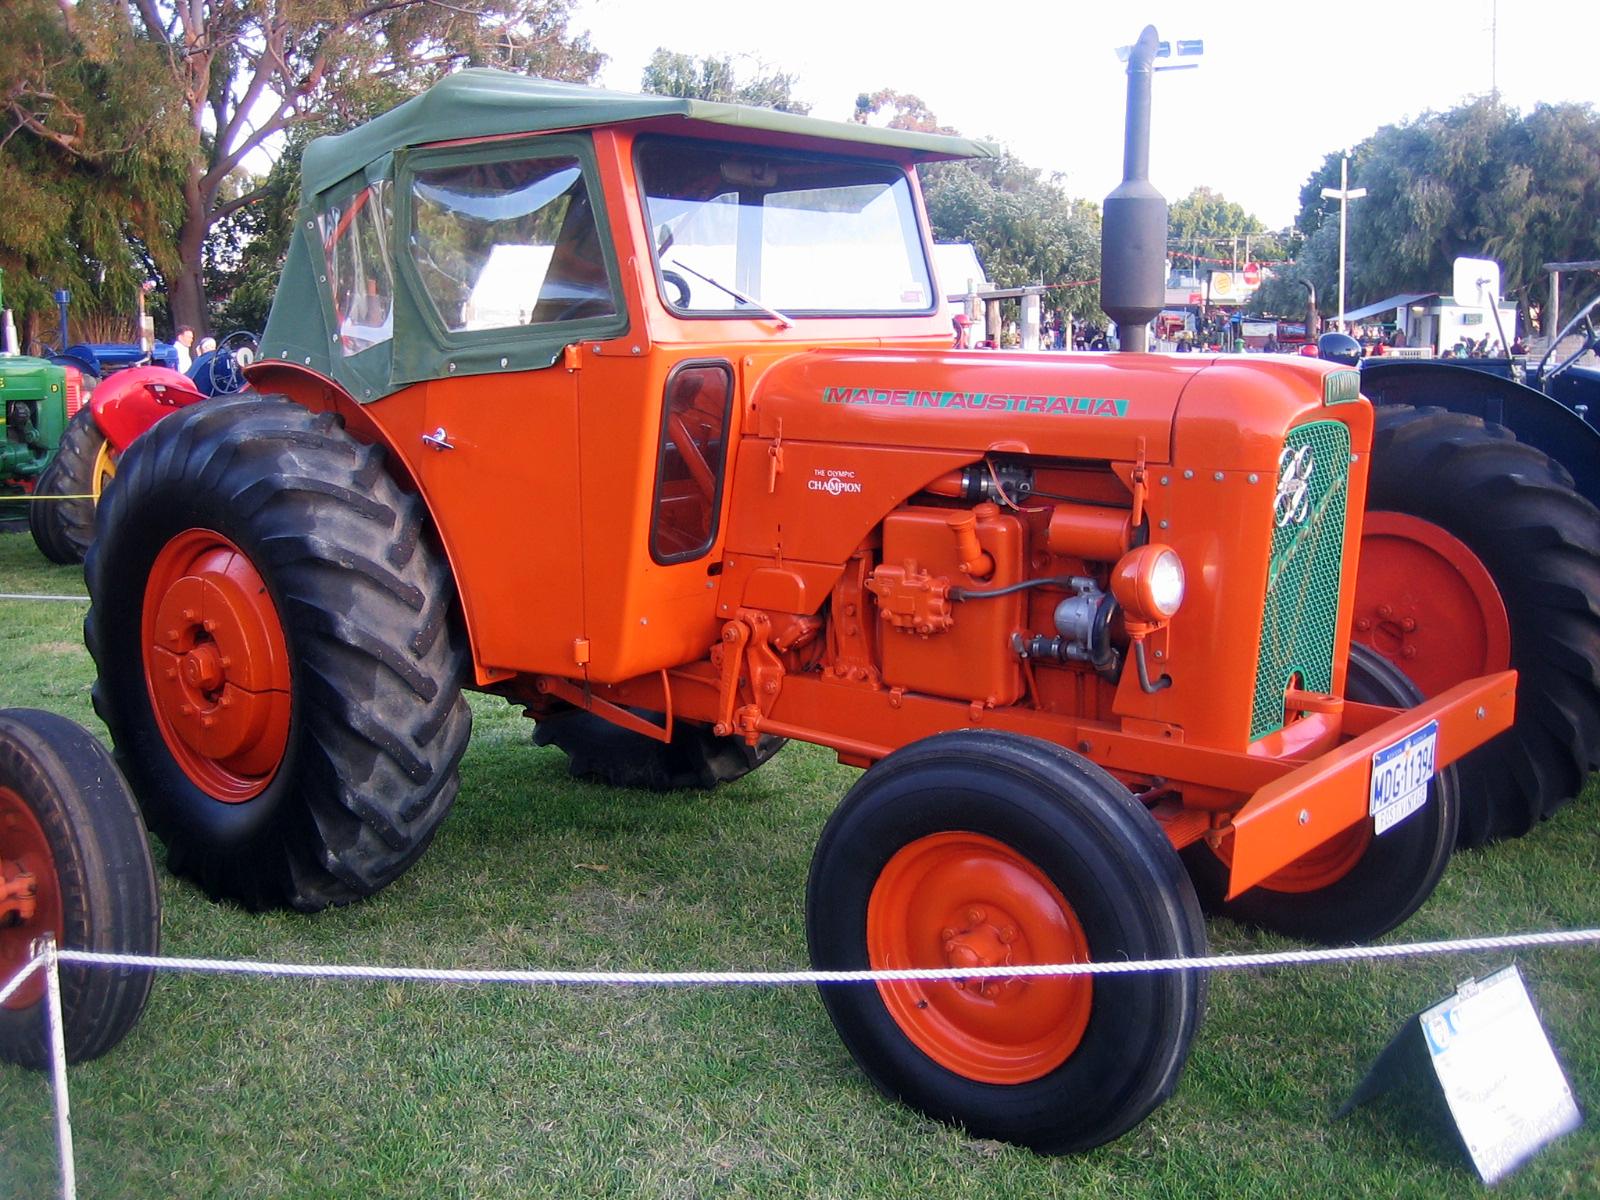 Champion Tractor Seats : File chamberlain g champion tractor at perth royal